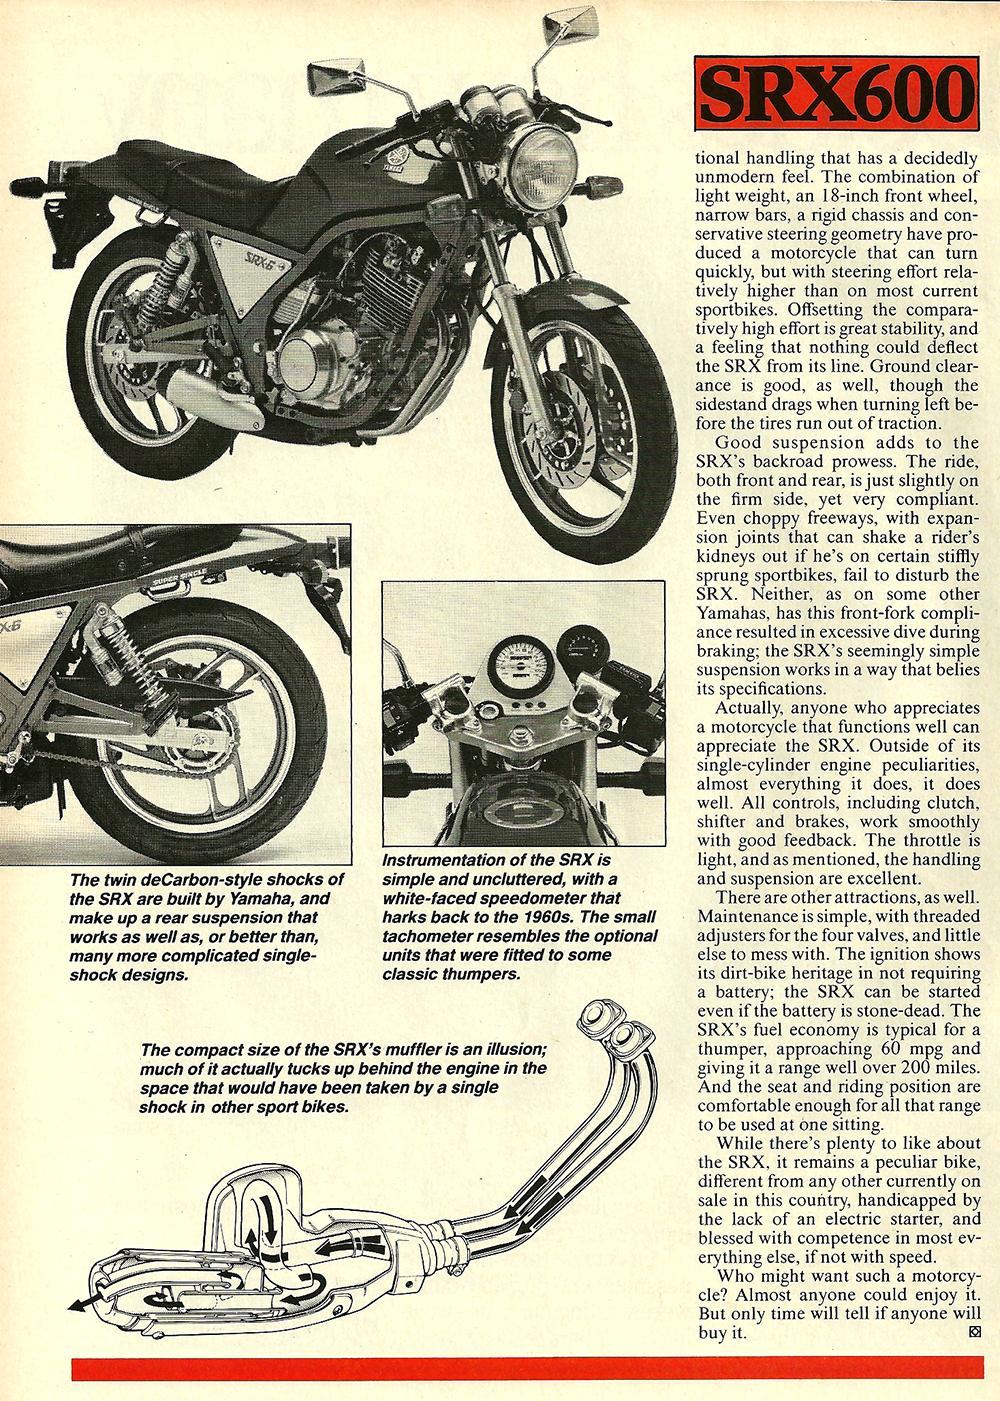 1986 Yamaha SRX600 road test 05.jpg